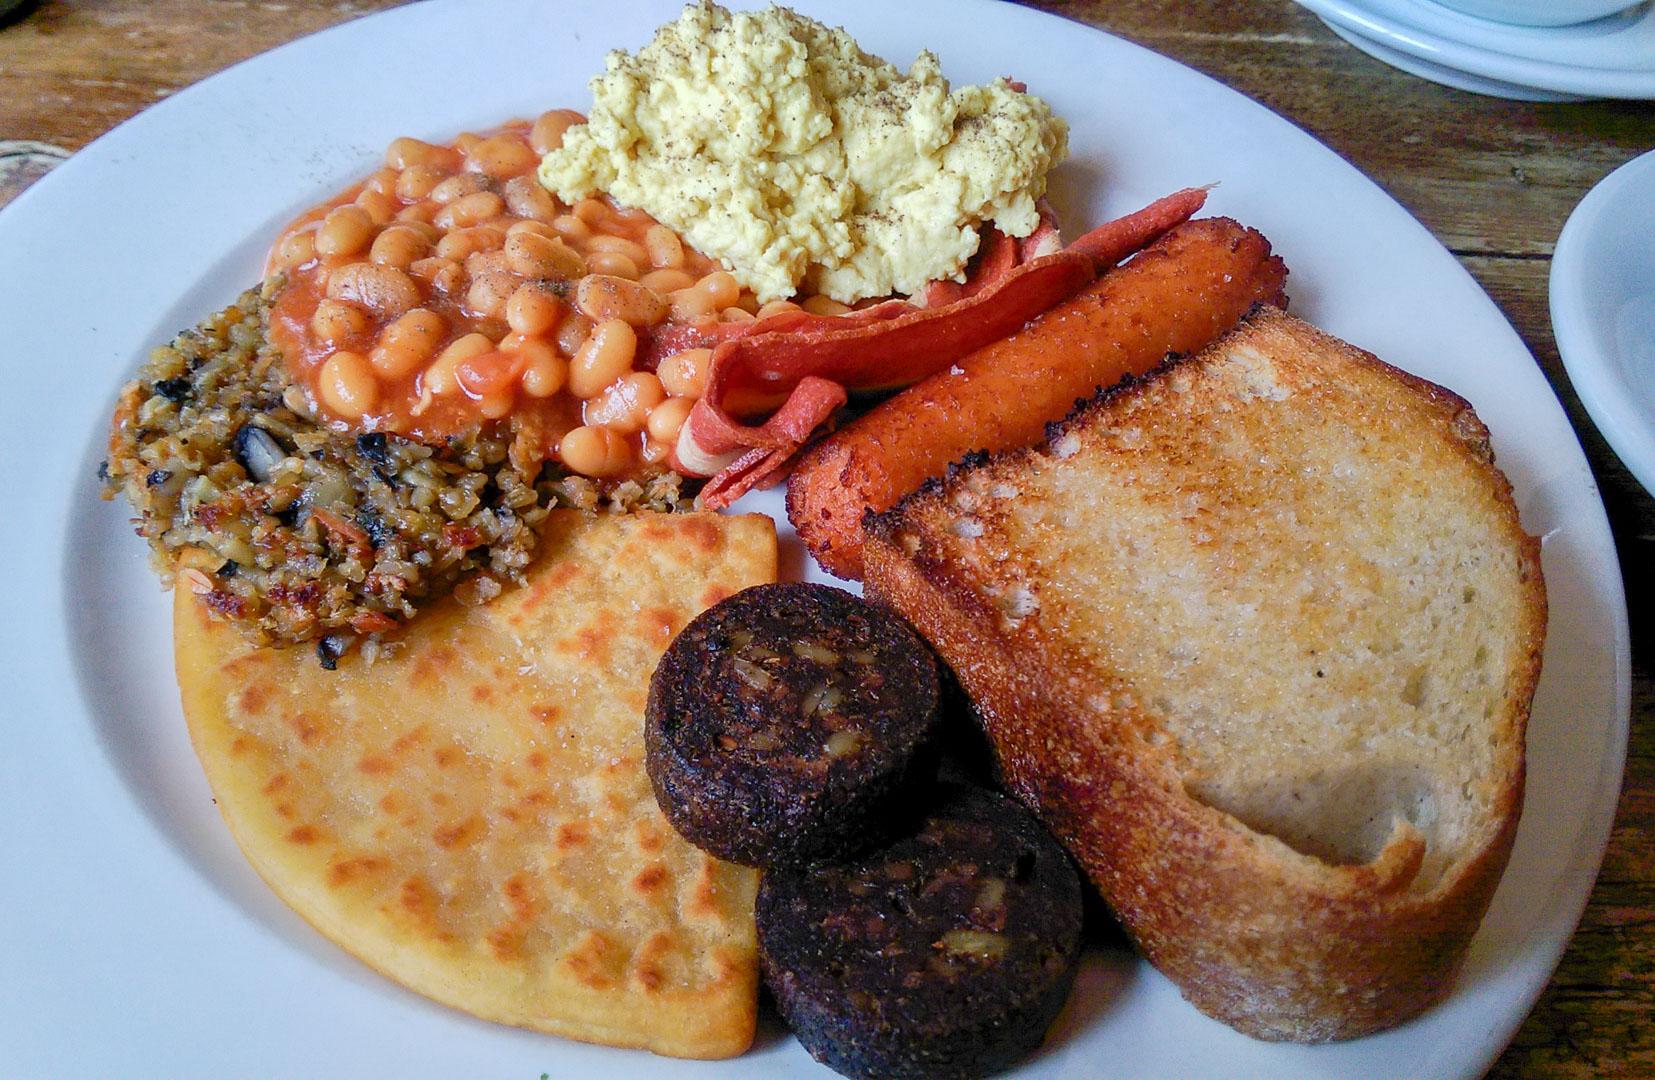 A small vegan Scottish Breakfast: veg. haggis, baked beans, scrambled tofu, veg. bacon, veg. sausage, toast, veg. black pudding, and a tattie scone!